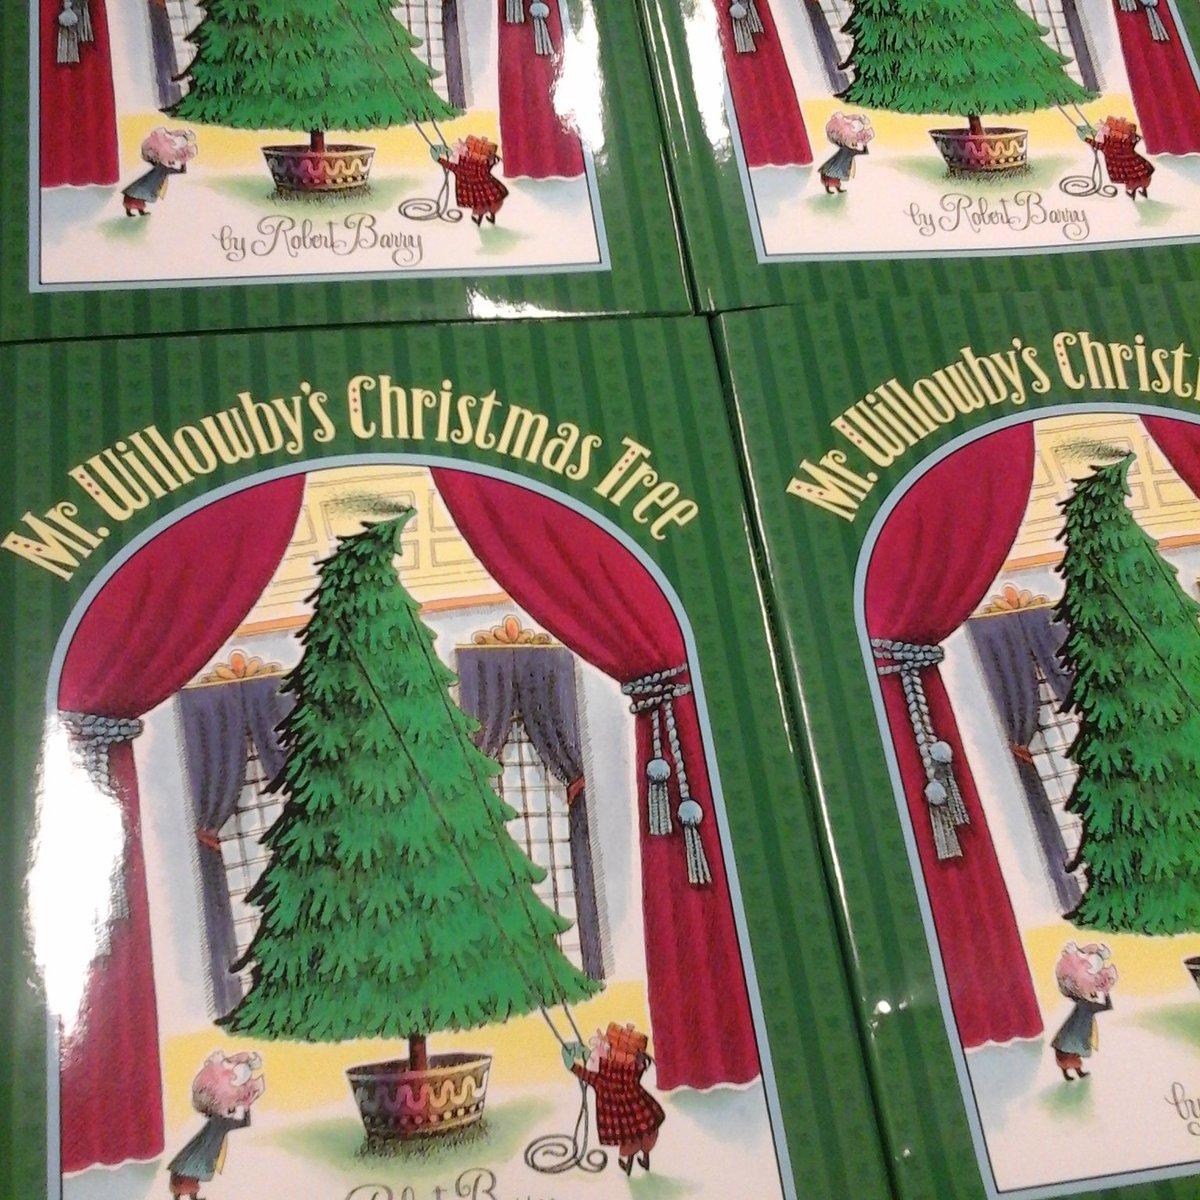 mrwillowbyschristmastree hashtag on Twitter